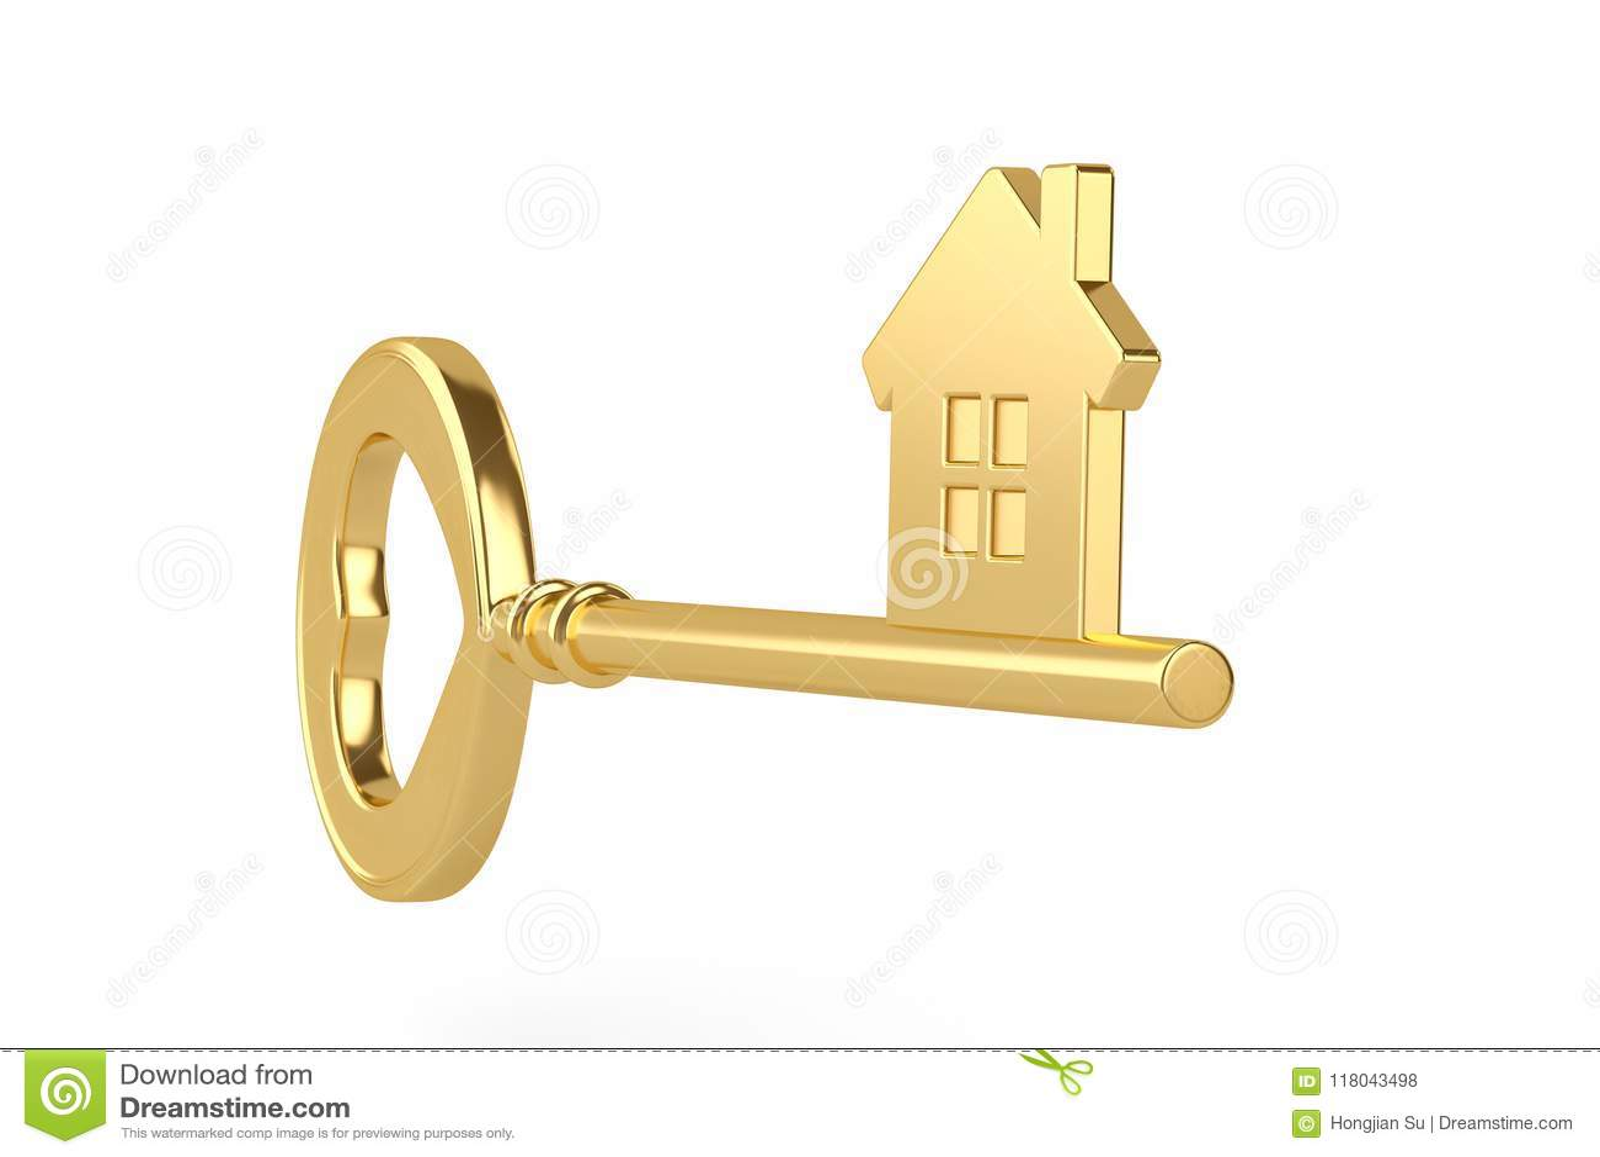 gold house key. Gold House Key On White Background.3D Illustration. Silhouette, Open.